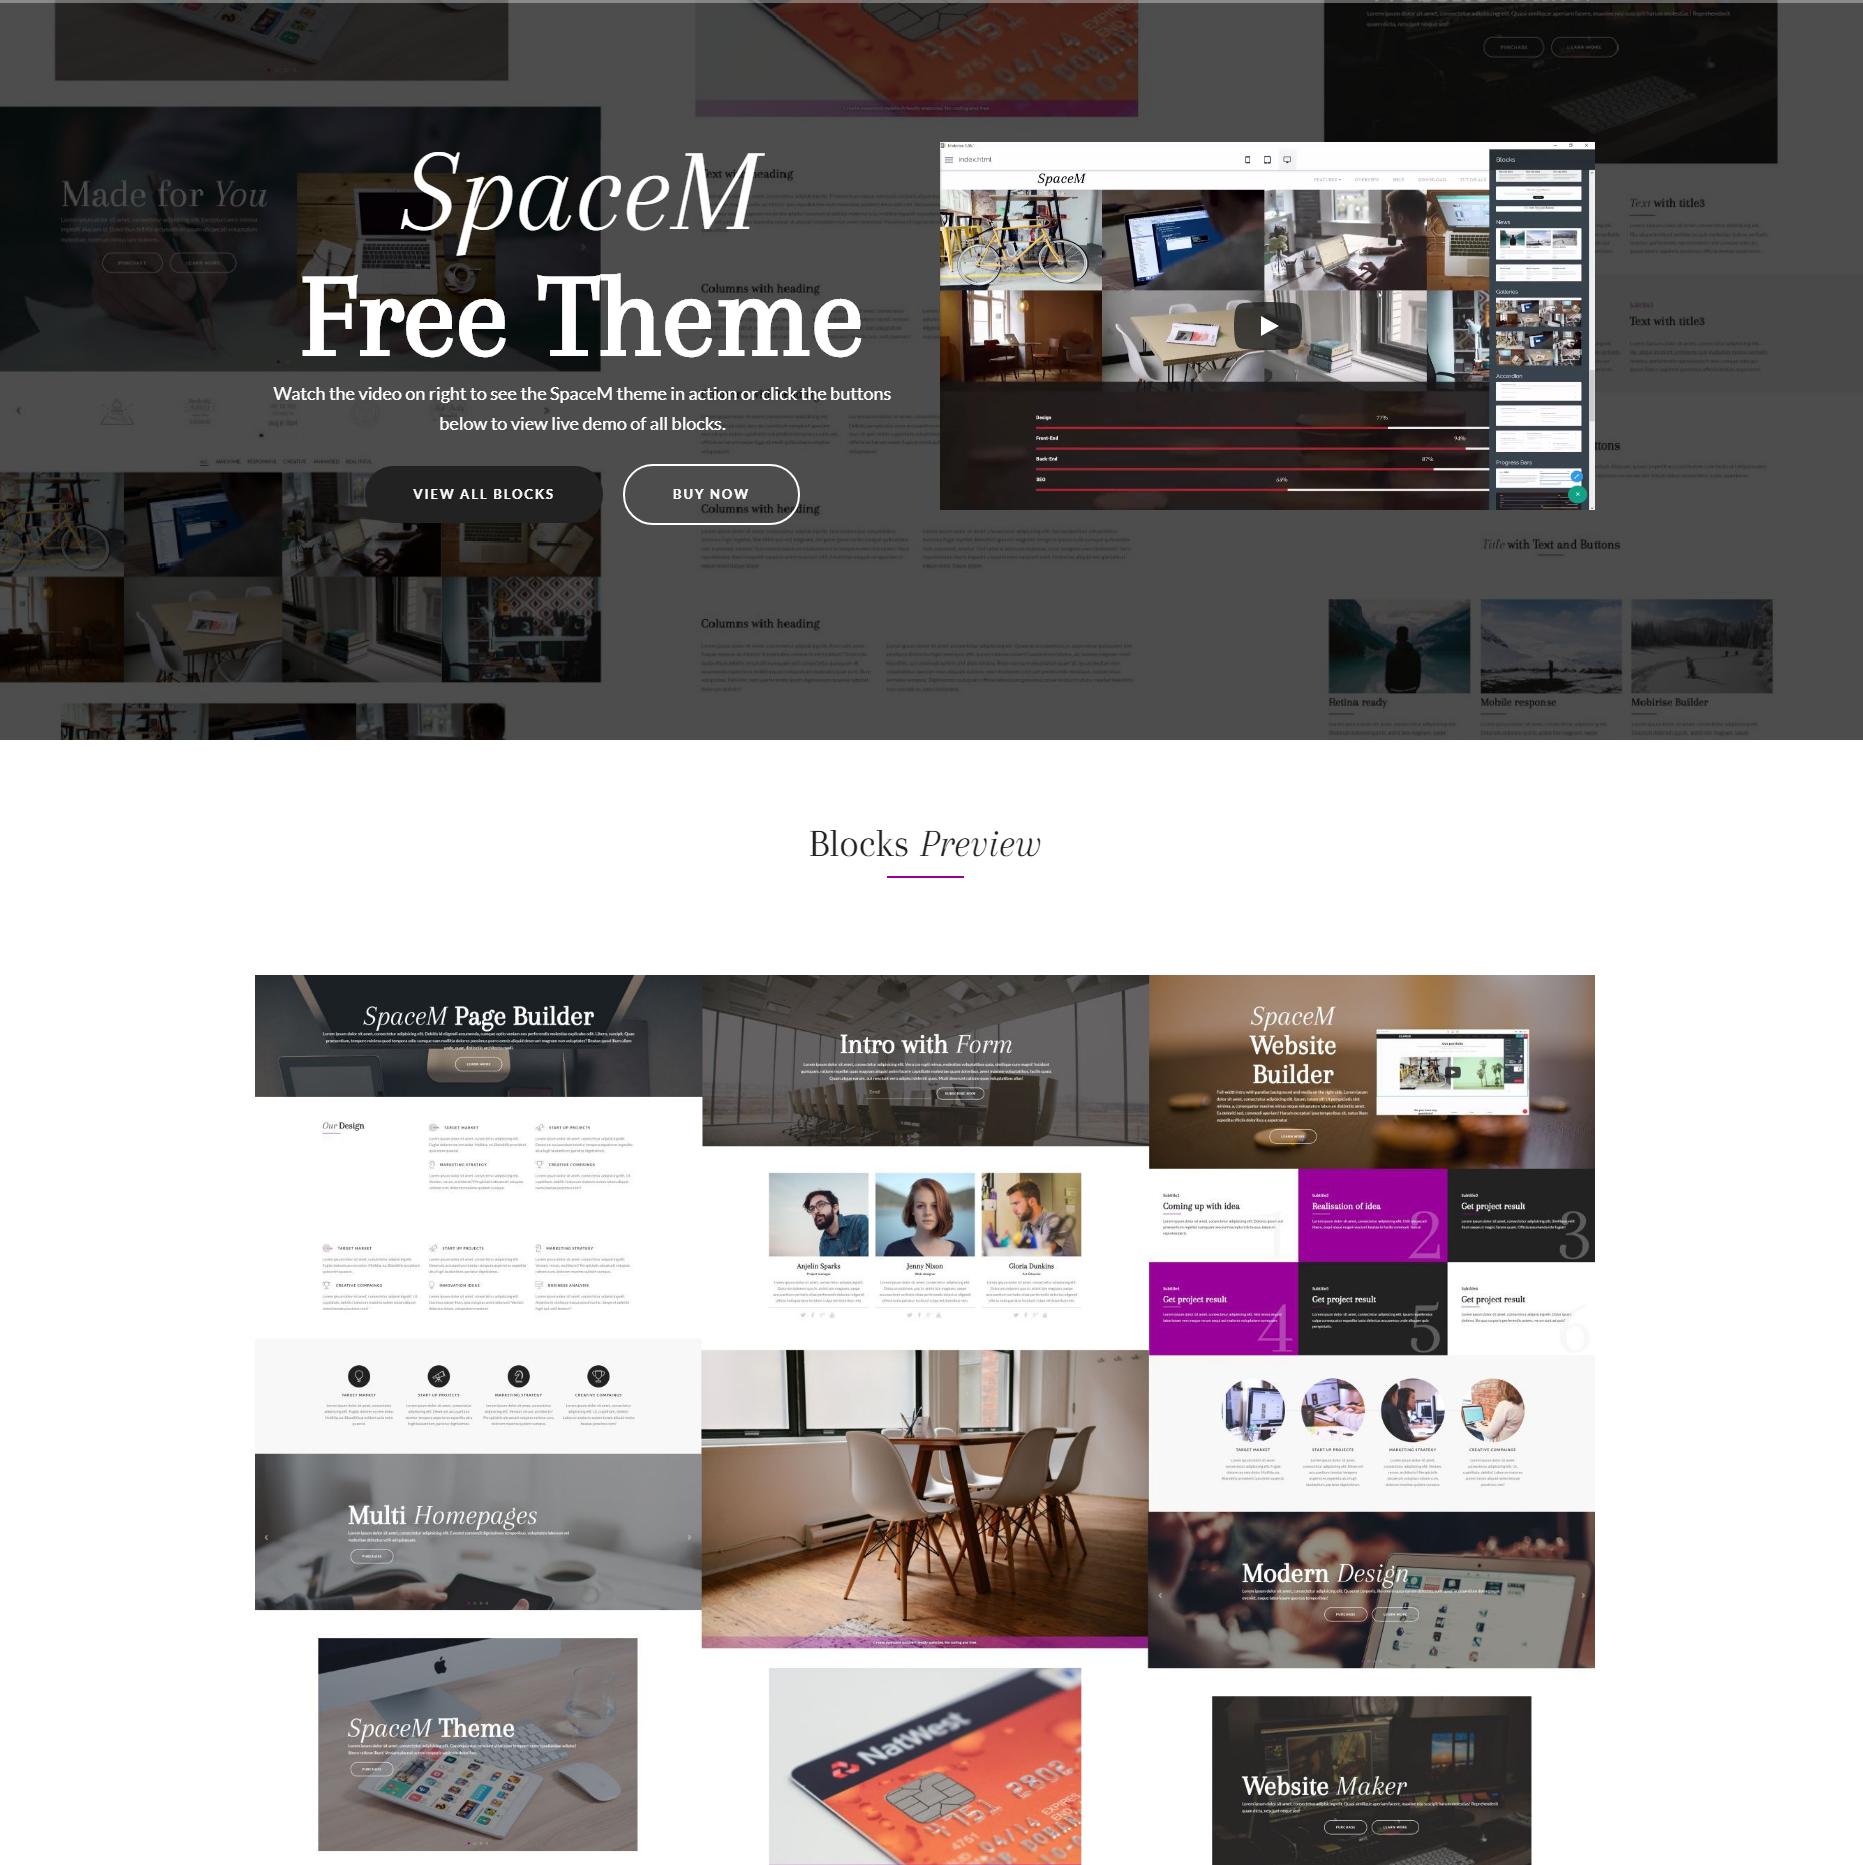 SpaceM Free Bootstrap Theme